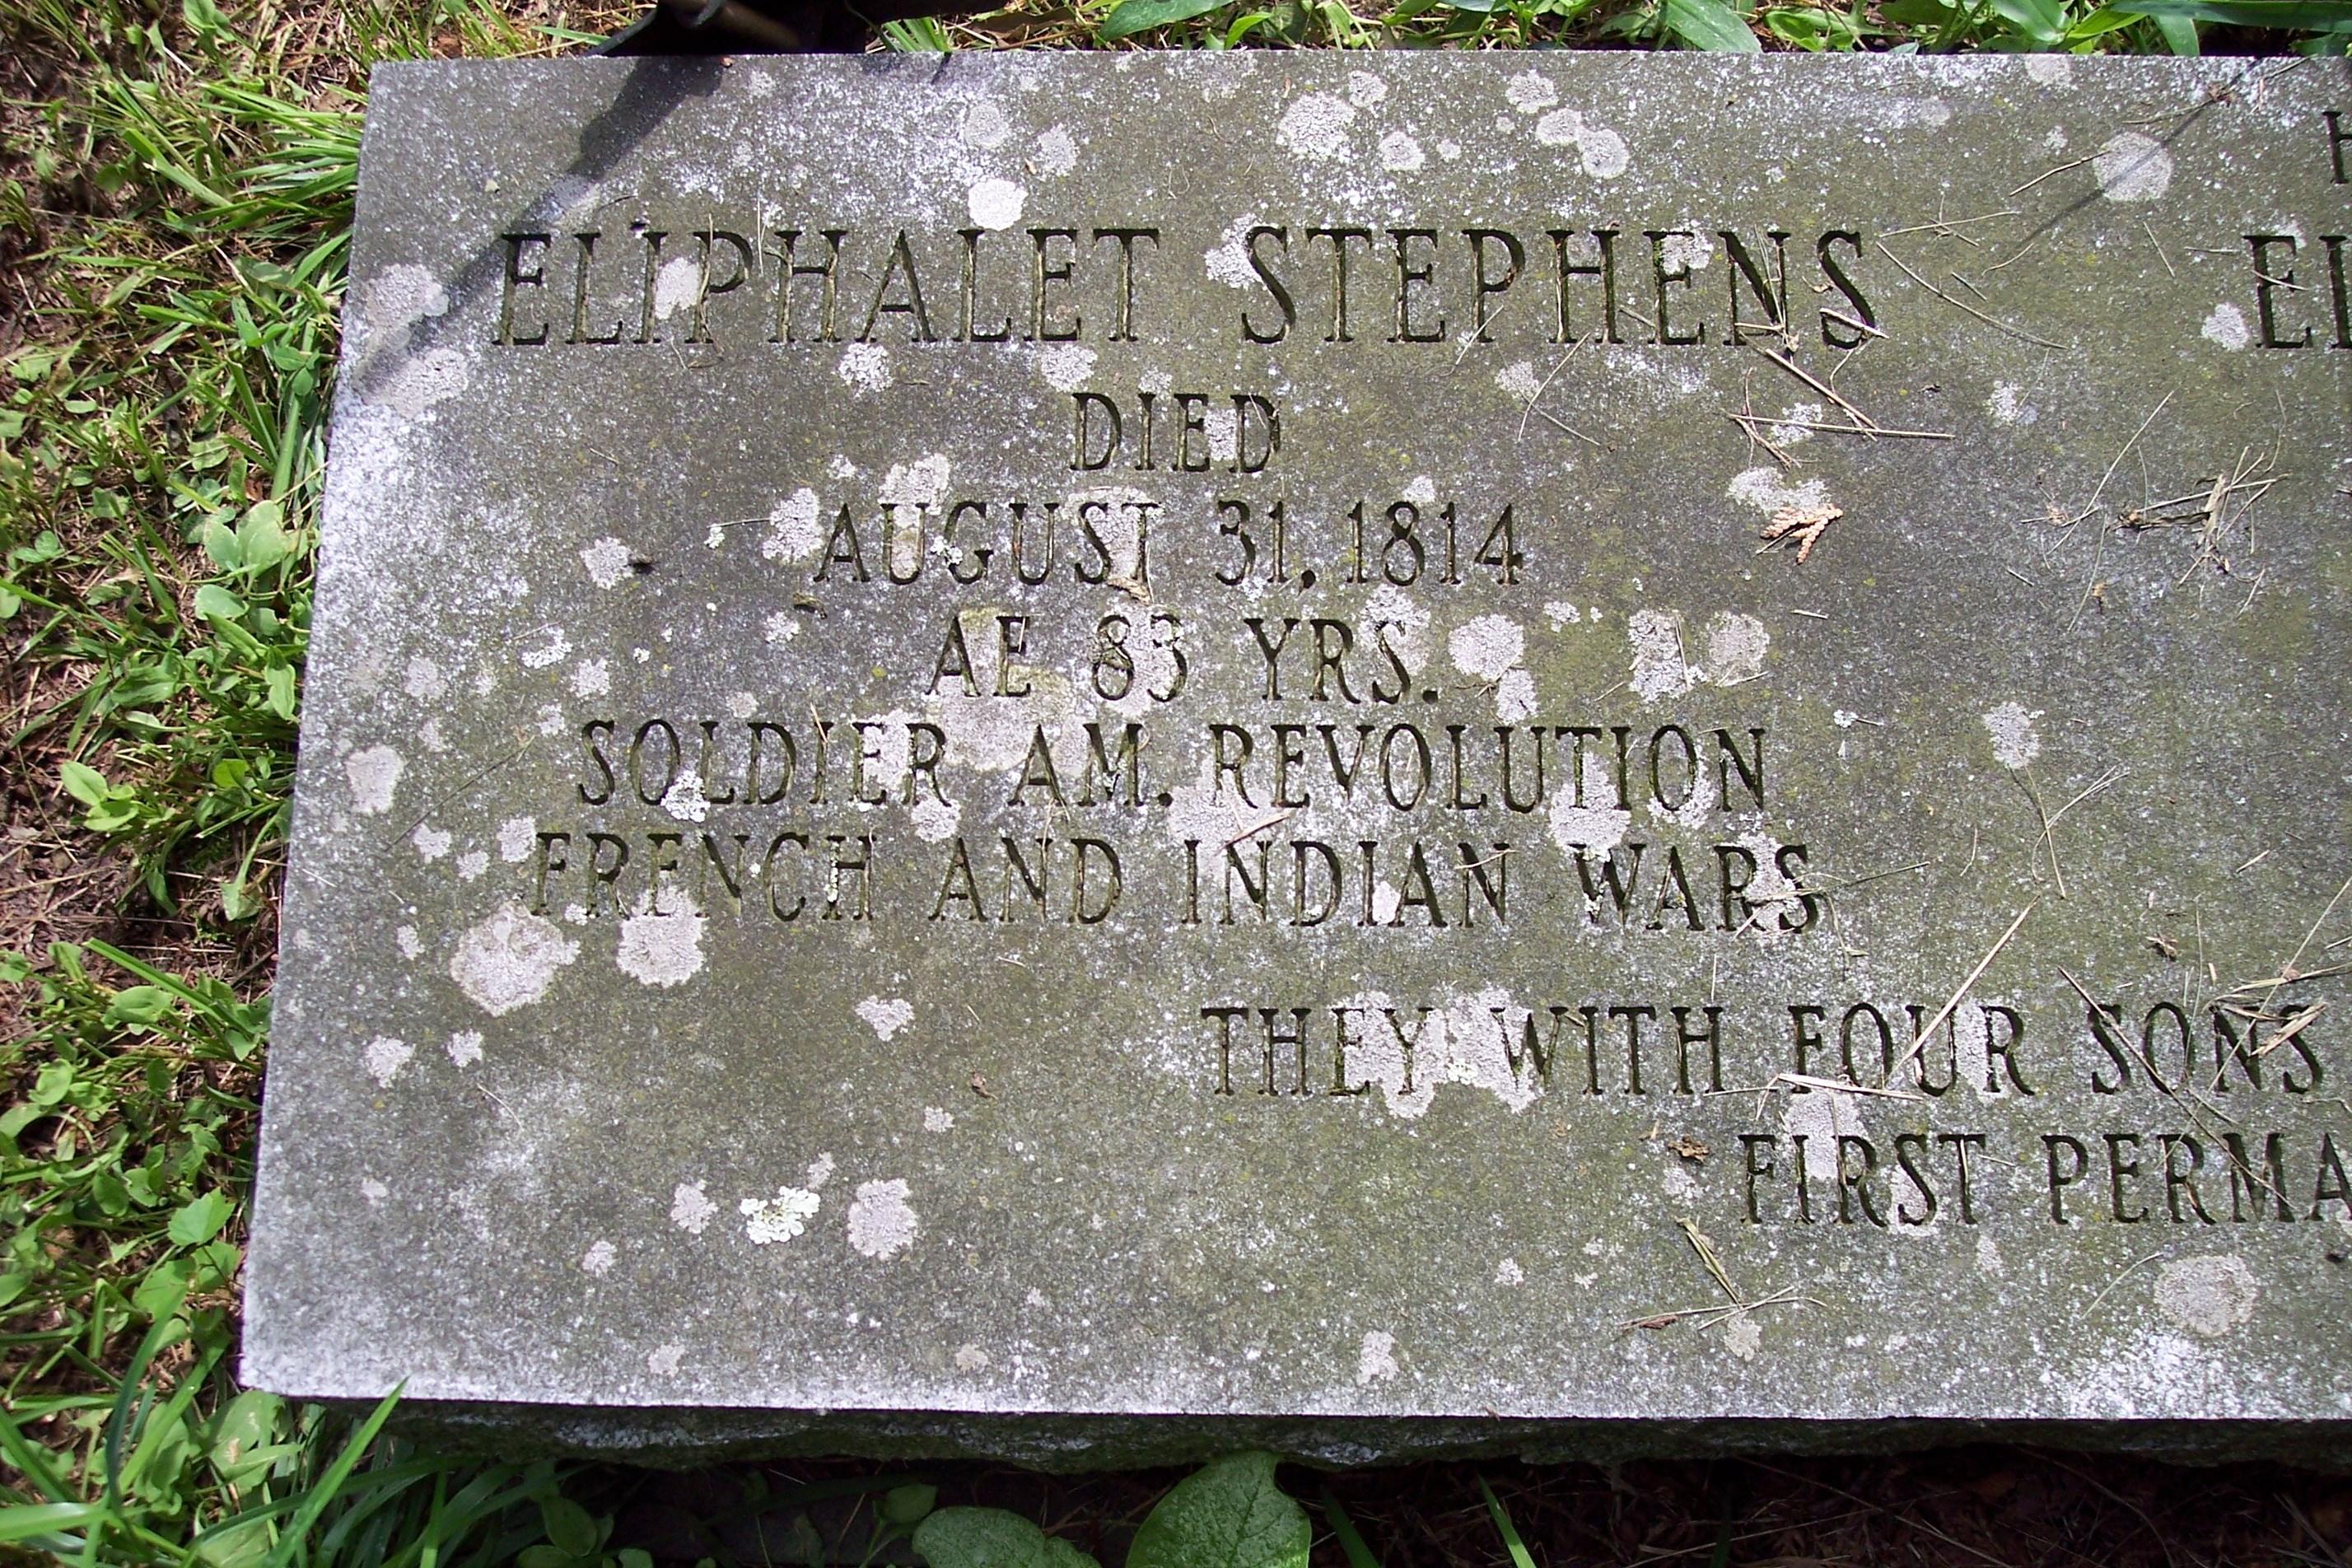 Eliphalet Stephens